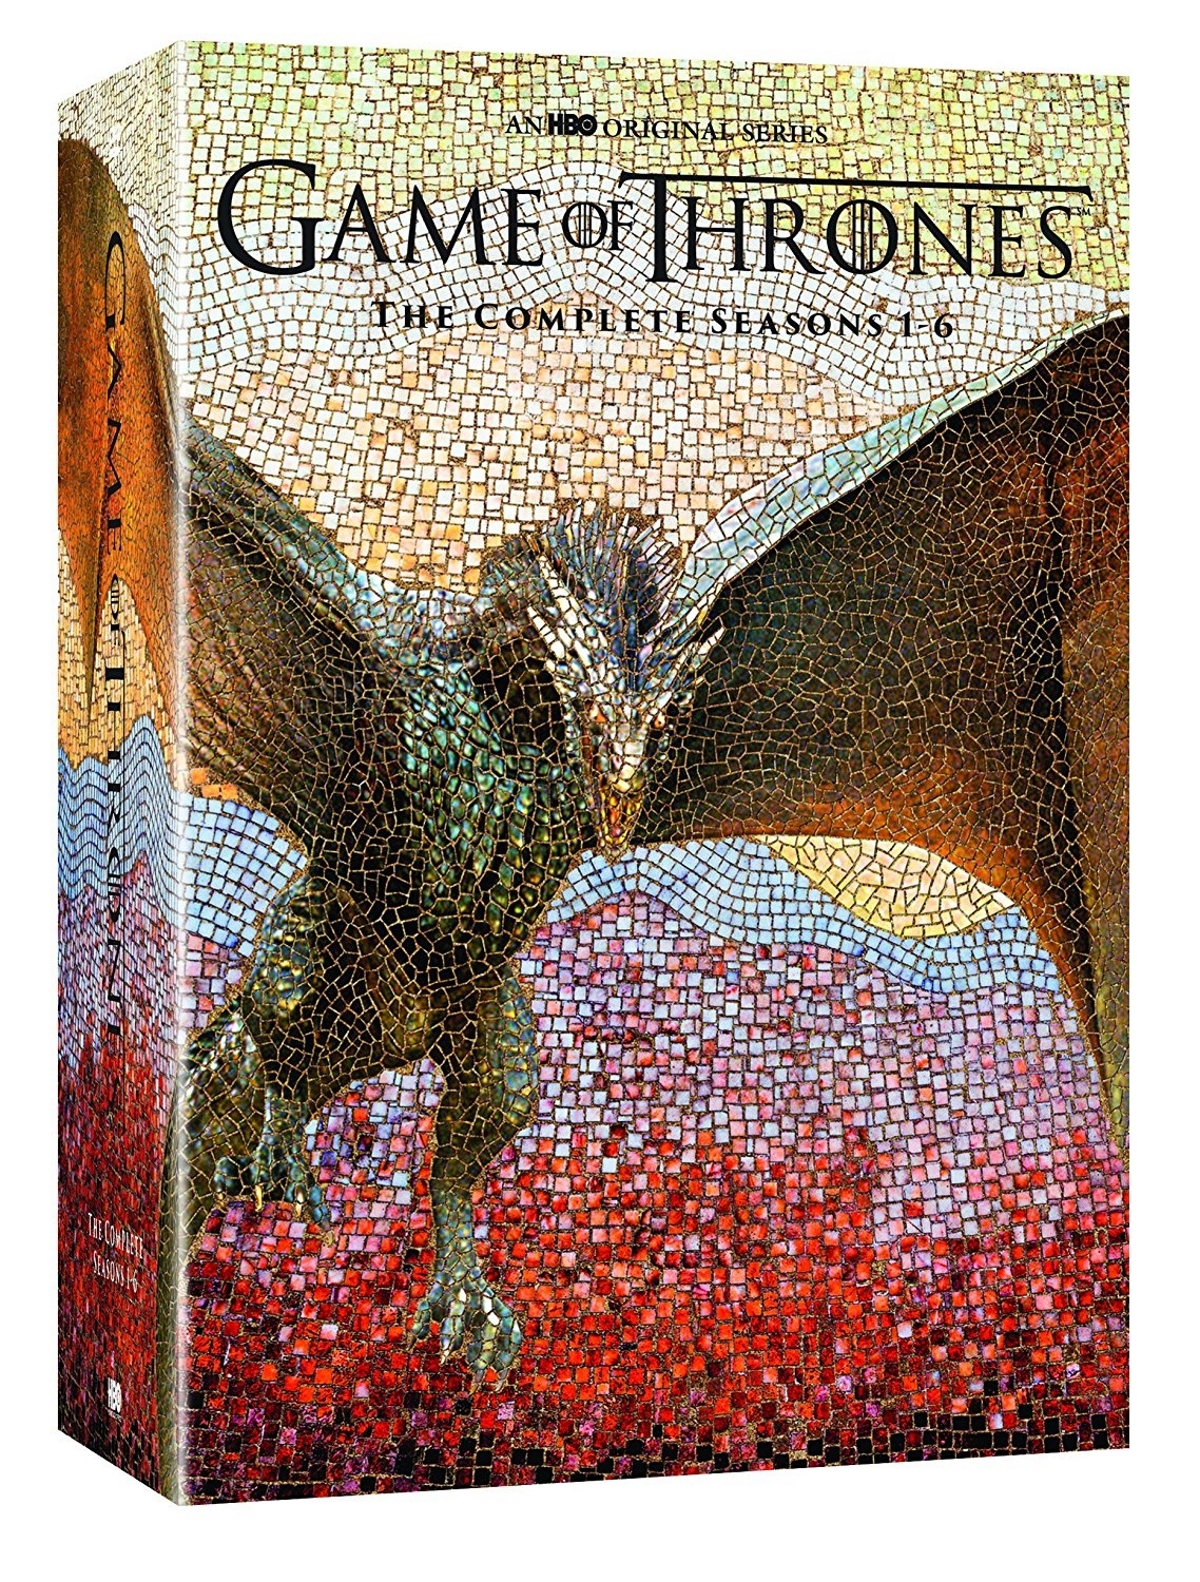 Game of thrones seasons one six boxset 1 6  dvd  2016  1 2 3 4 5 6